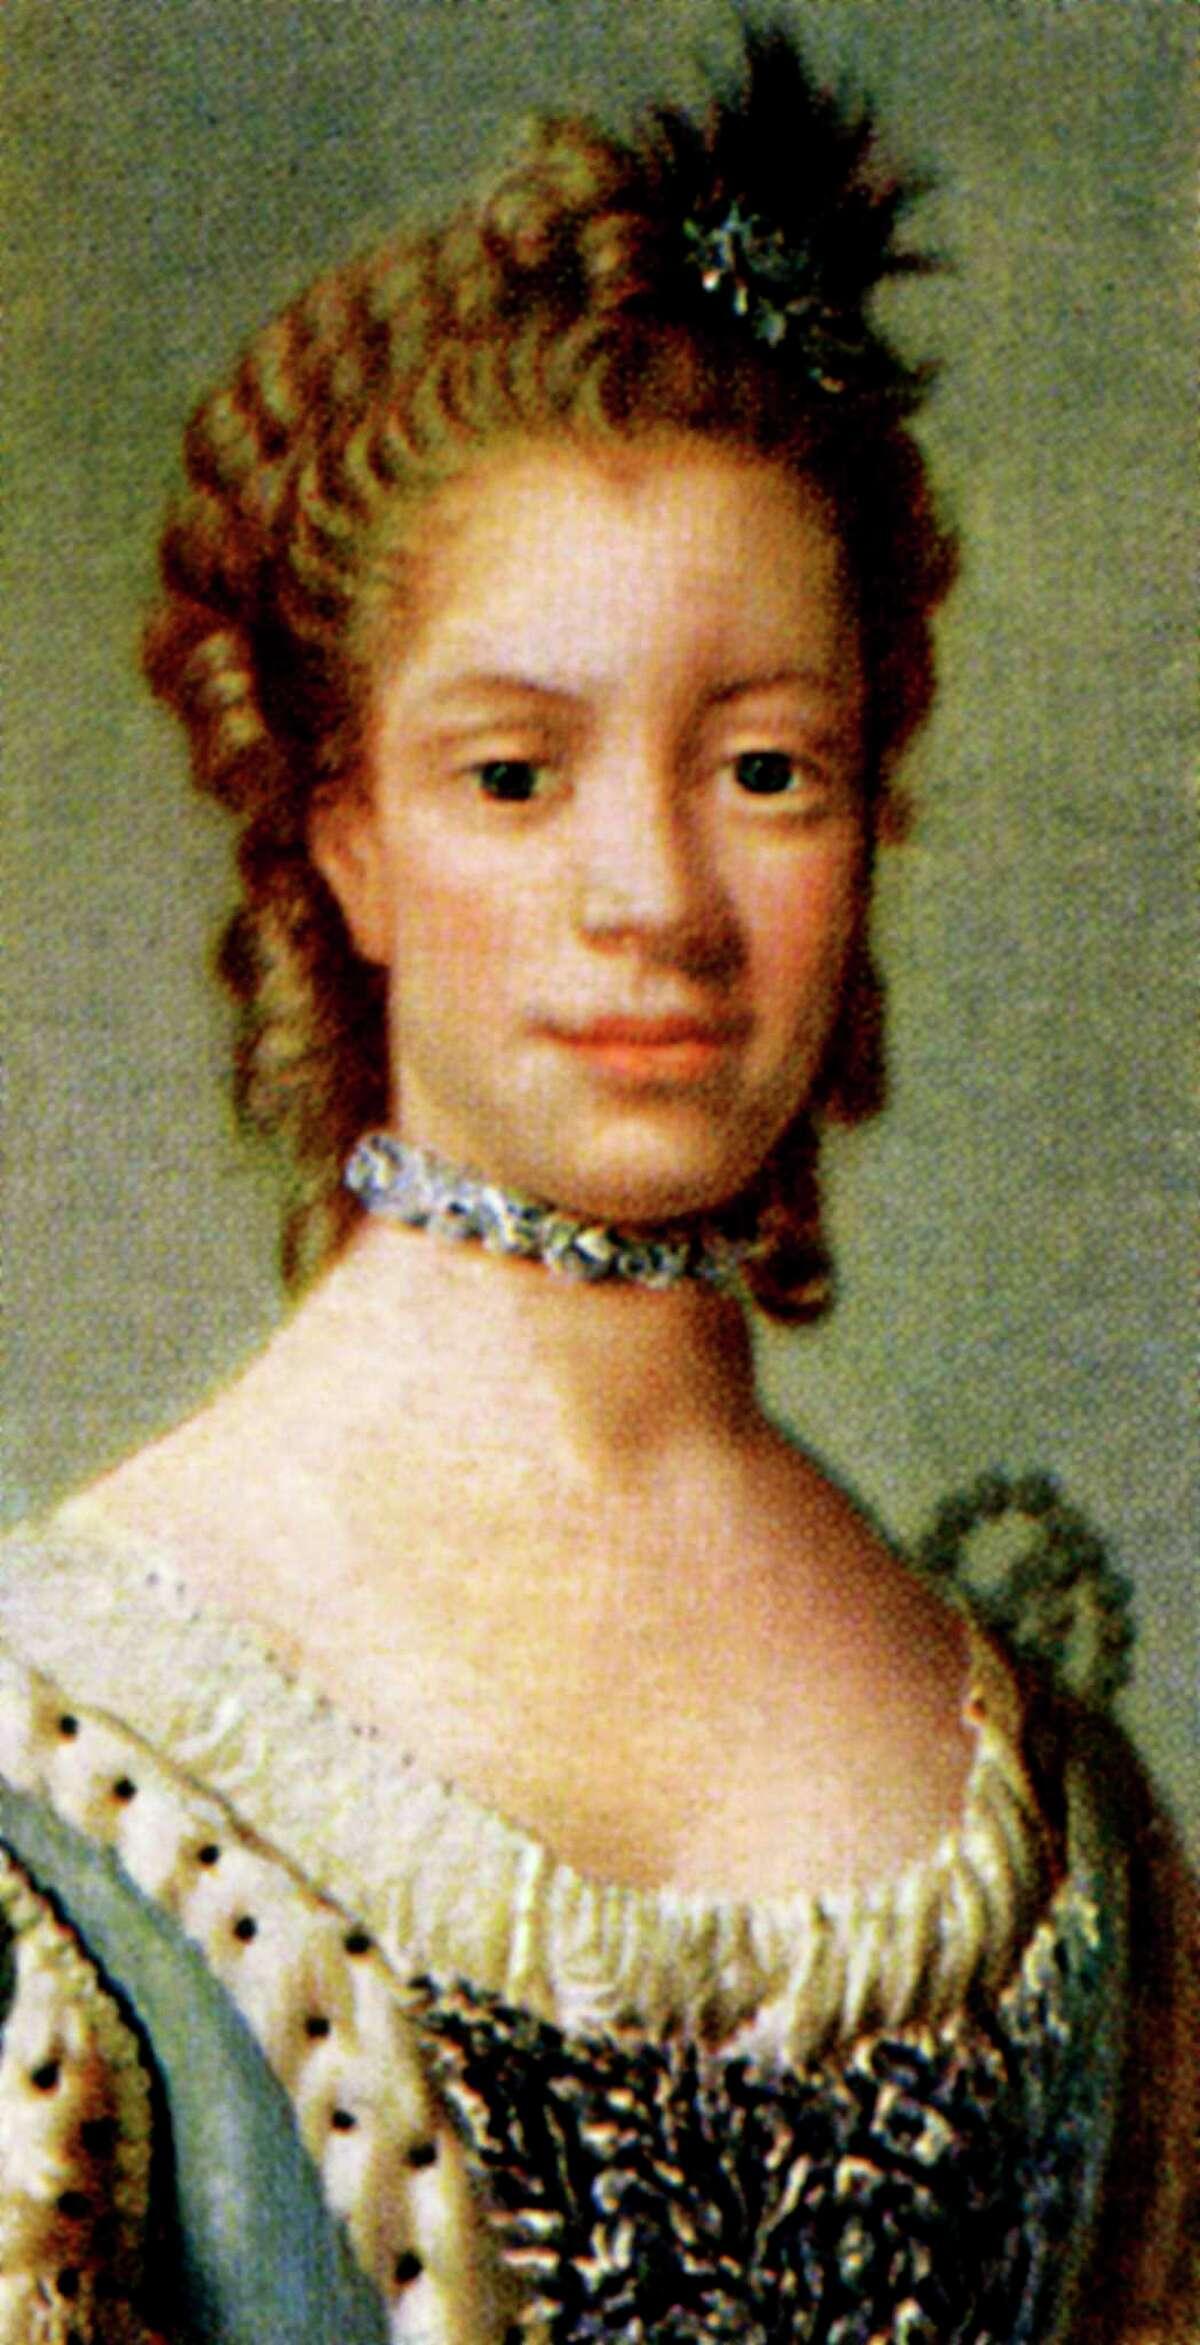 Queen Charlotte. Duchess Charlotte Sophia of Mecklenburg-Strelitz (Sophia Charlotte, 1738-1820) was the queen consort of King George III (1738-1820).